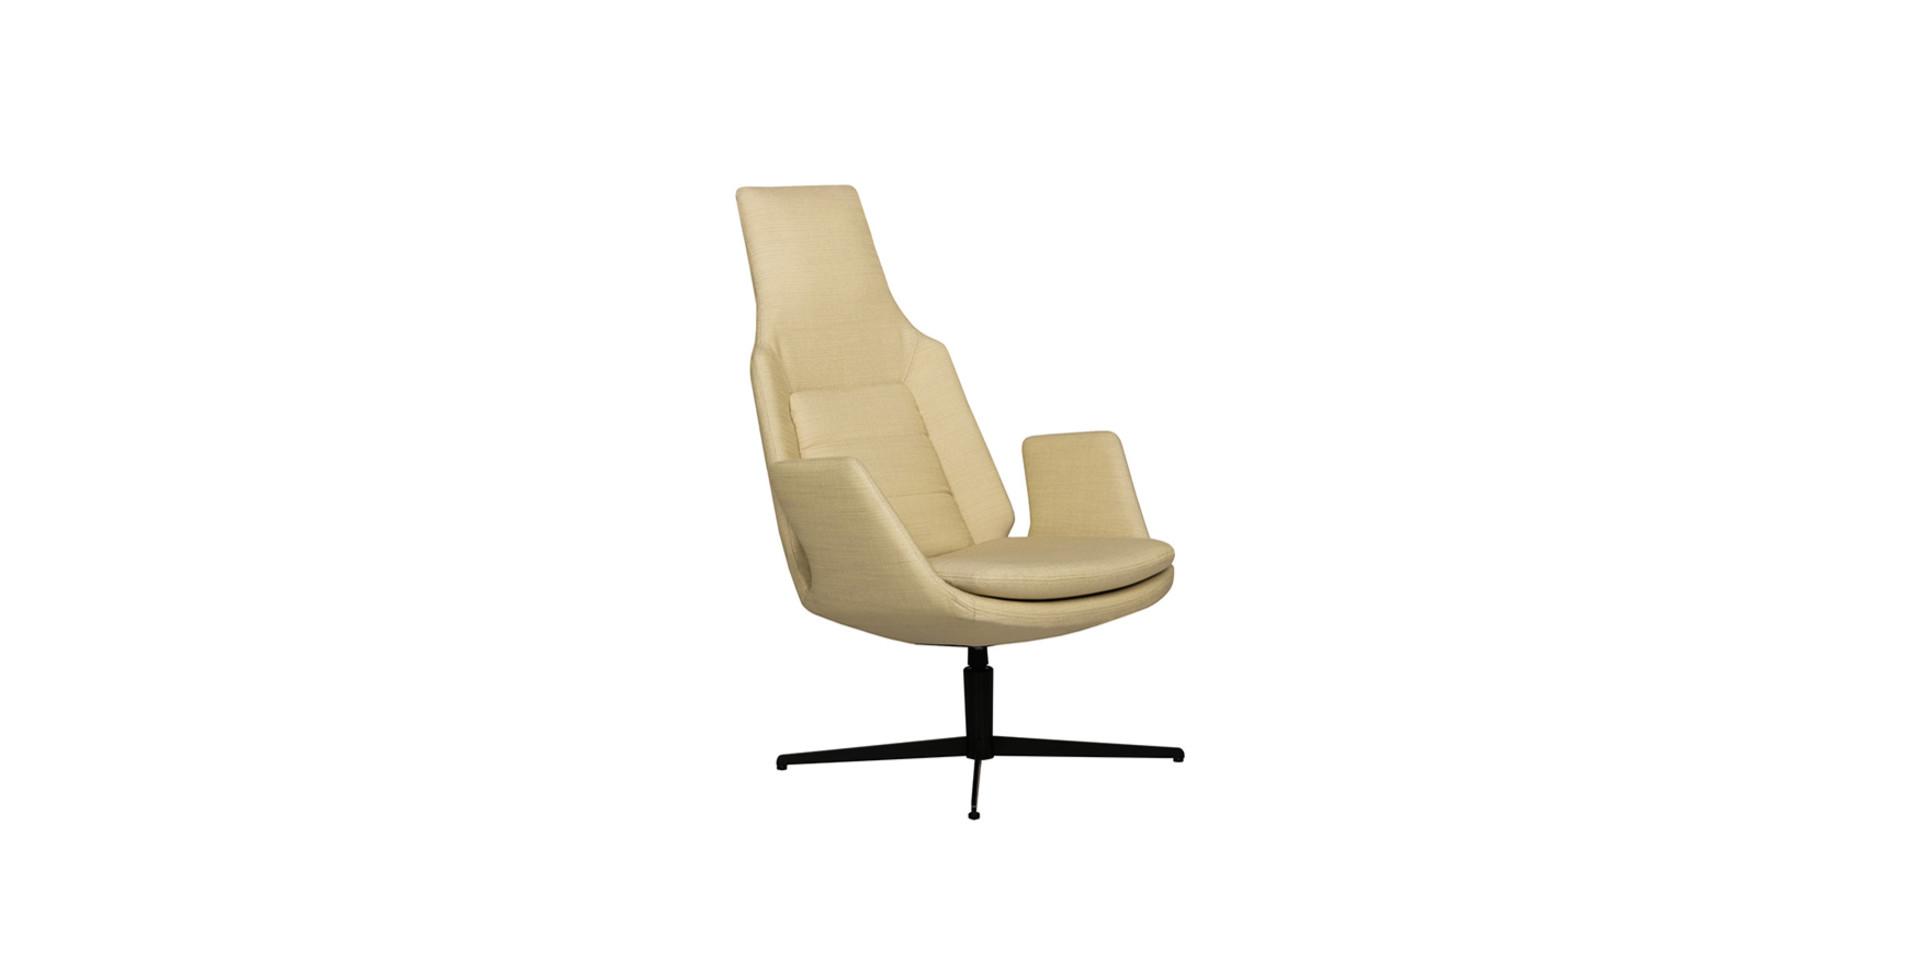 Sits Hope fauteuil-bona4_yellow_2